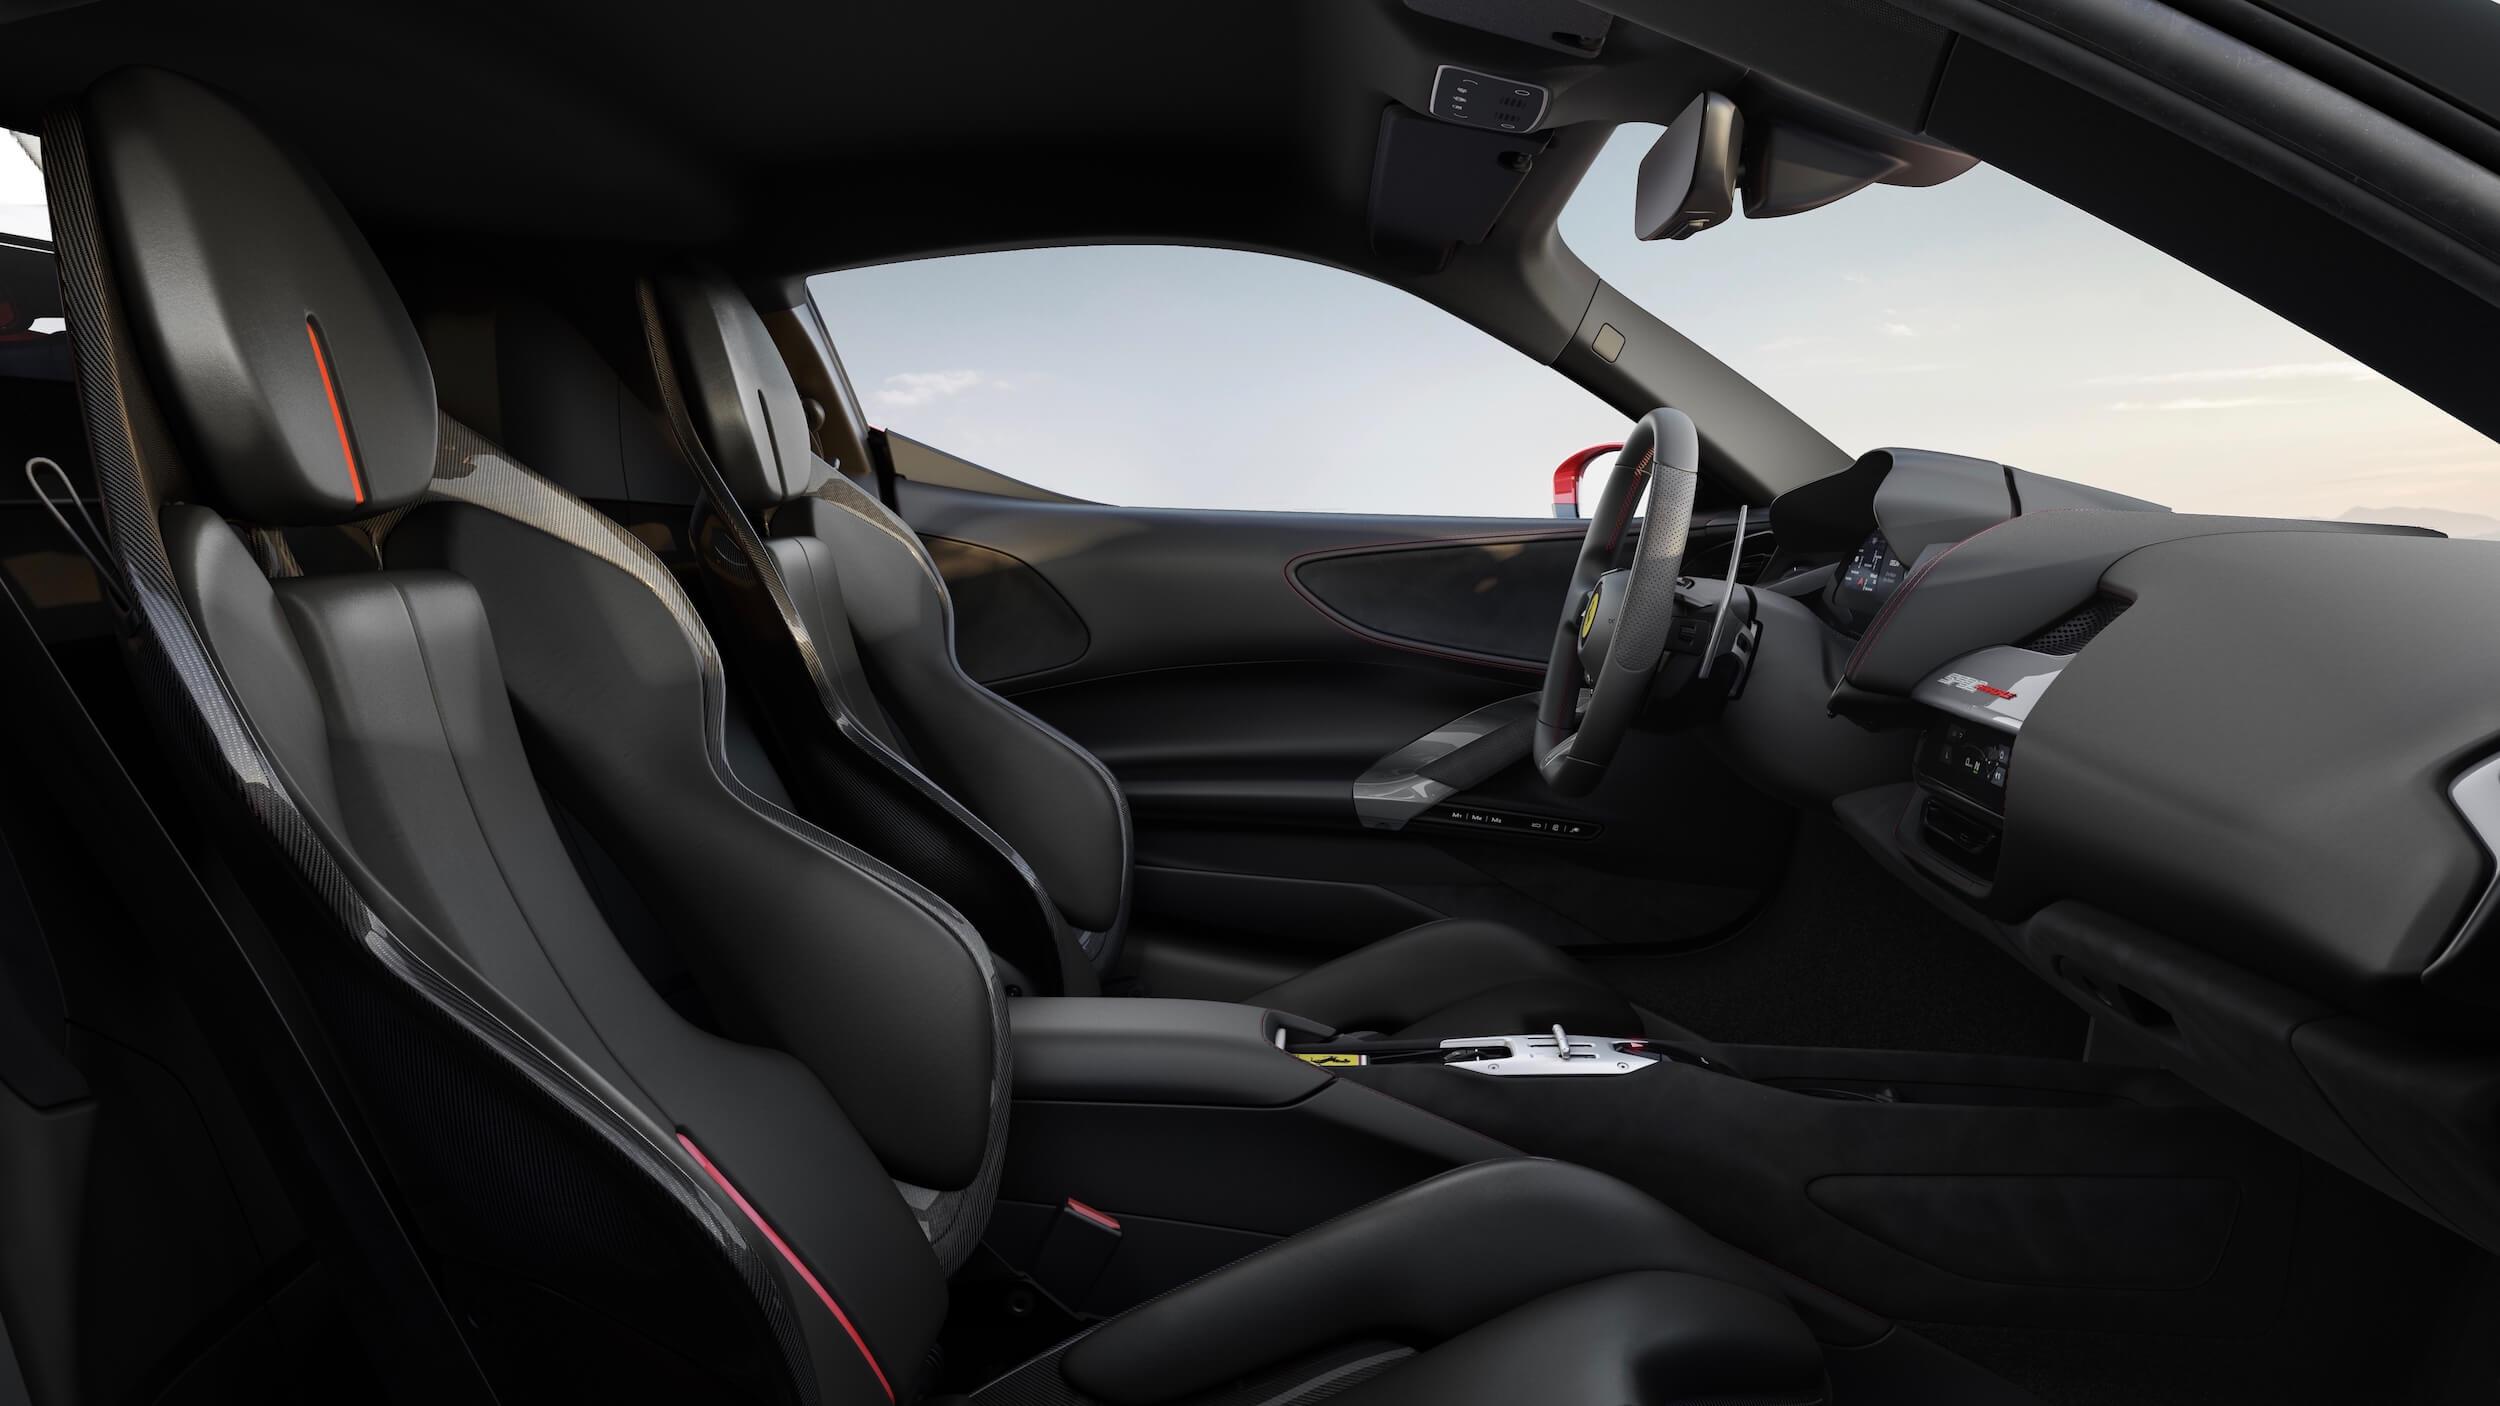 Ferrari SF90 Stradale cadeiras